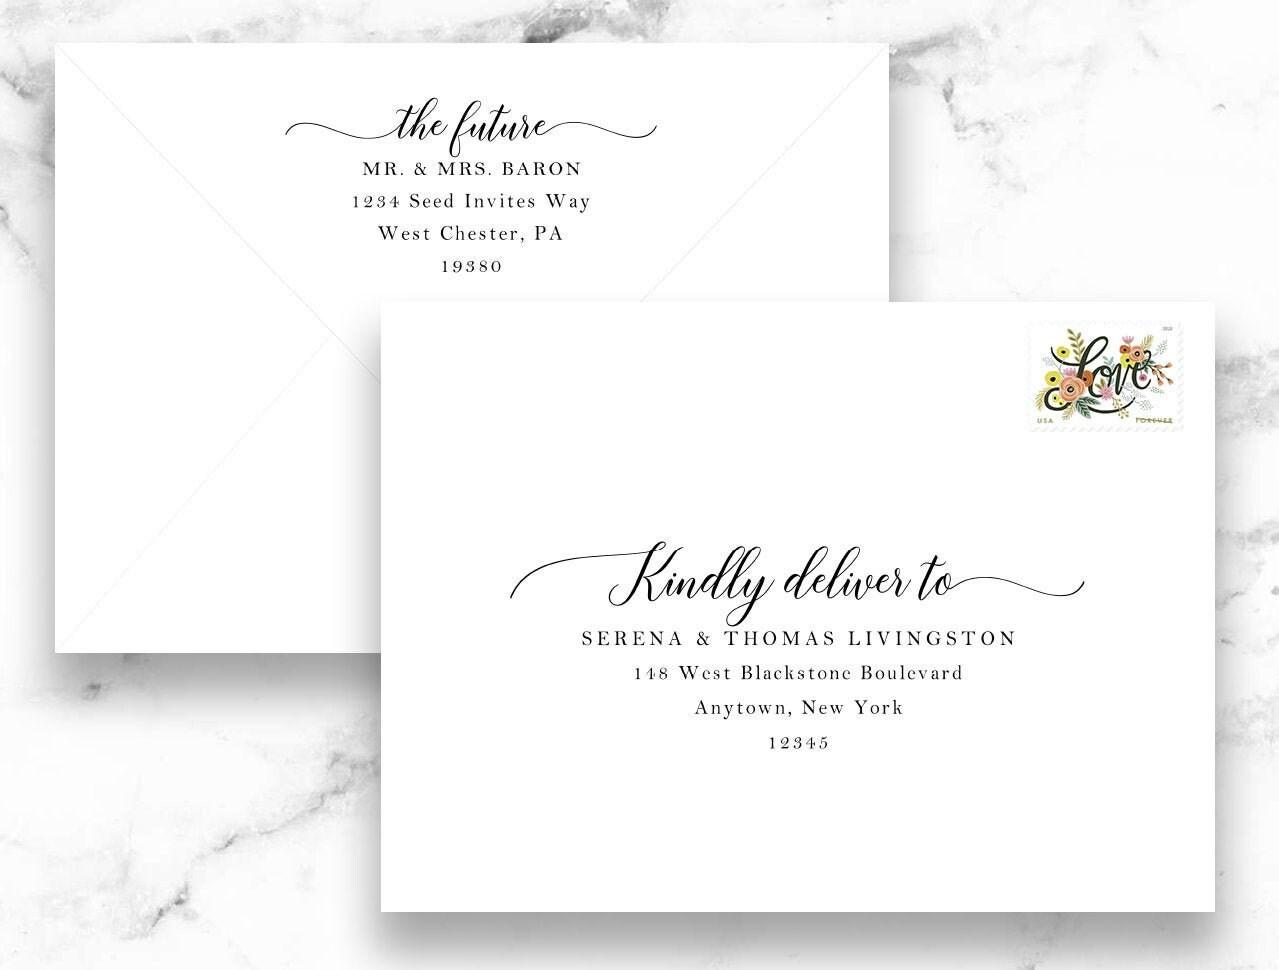 25 eucalyptus envelopes  5x7 a7 pointed flap envelopes